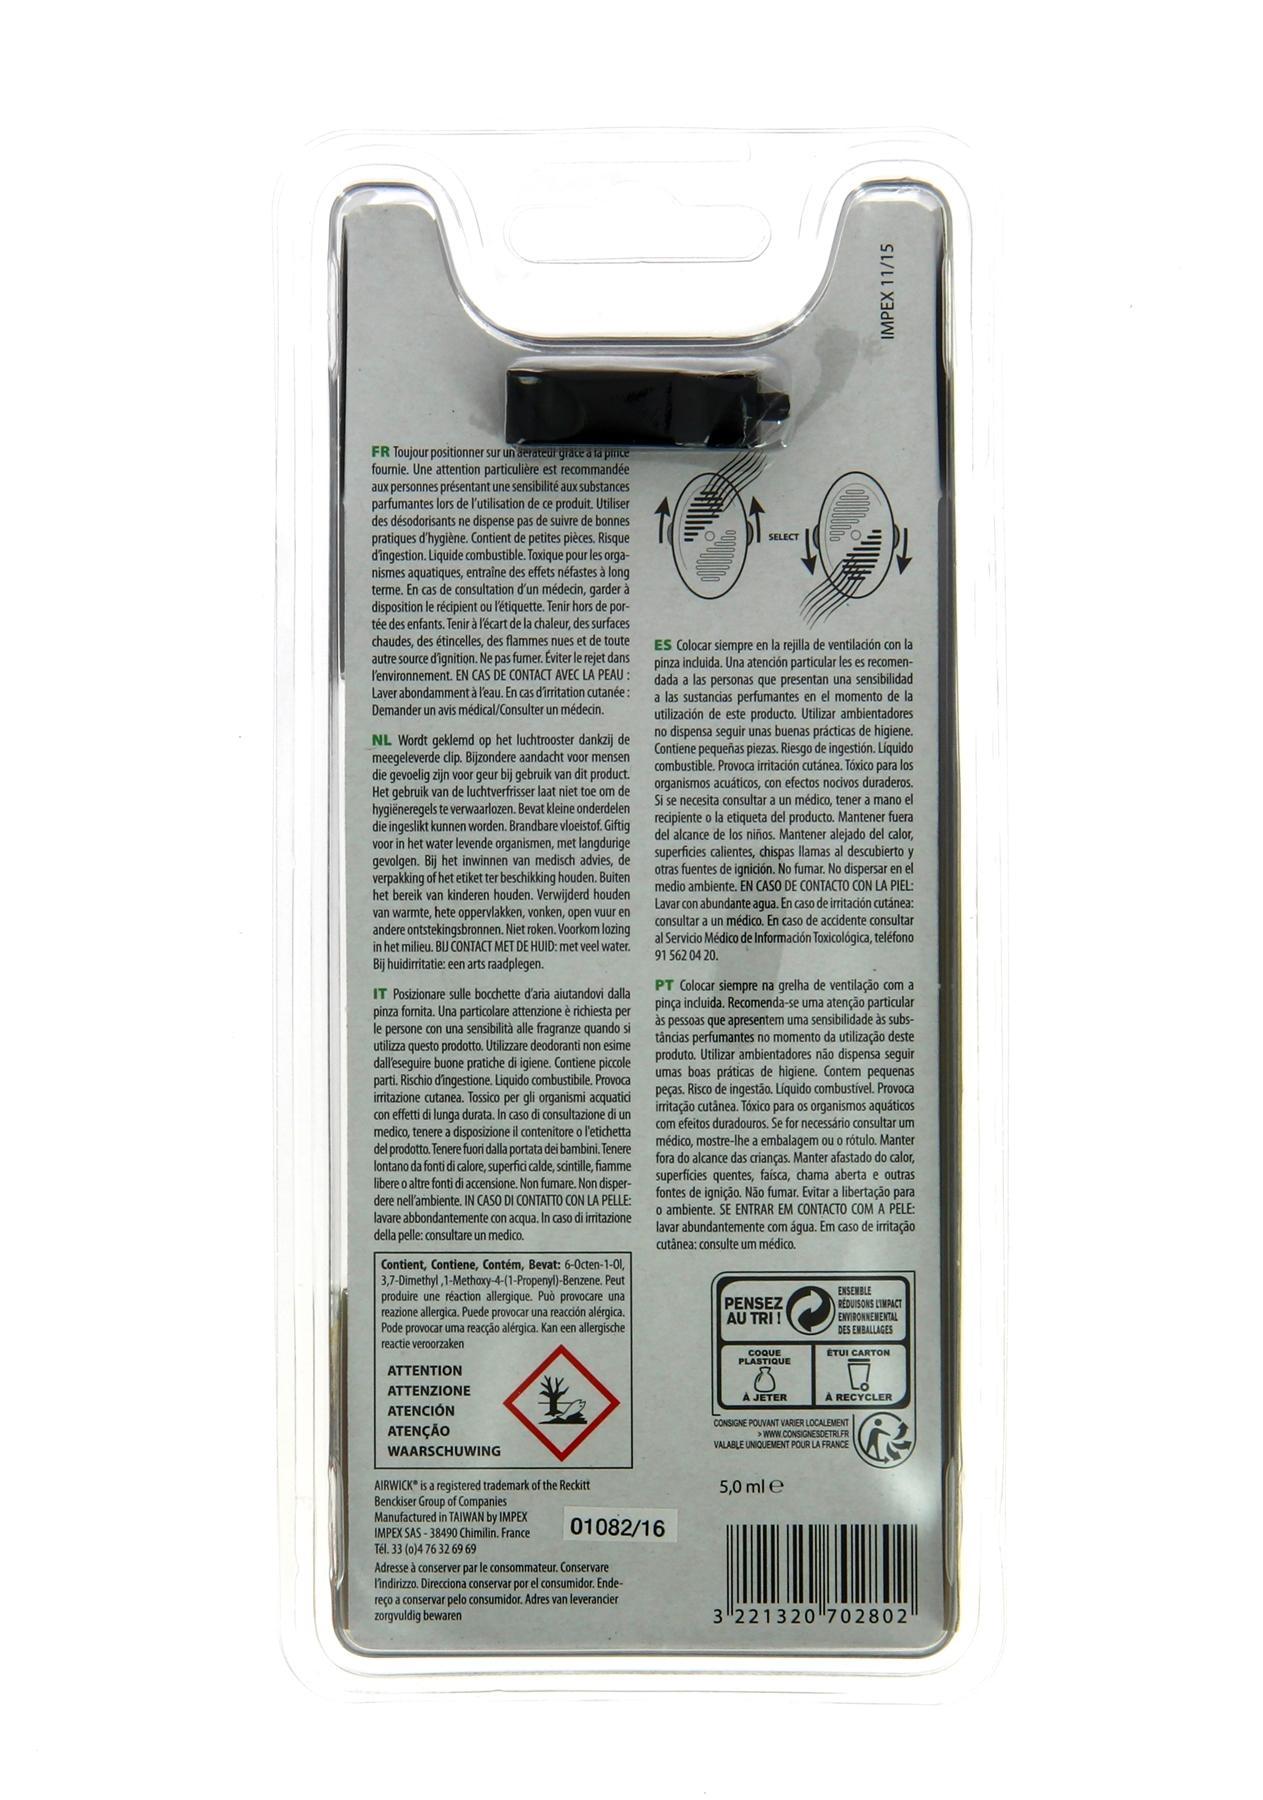 Lufterfrischer AIR WICK 070280 Bewertung